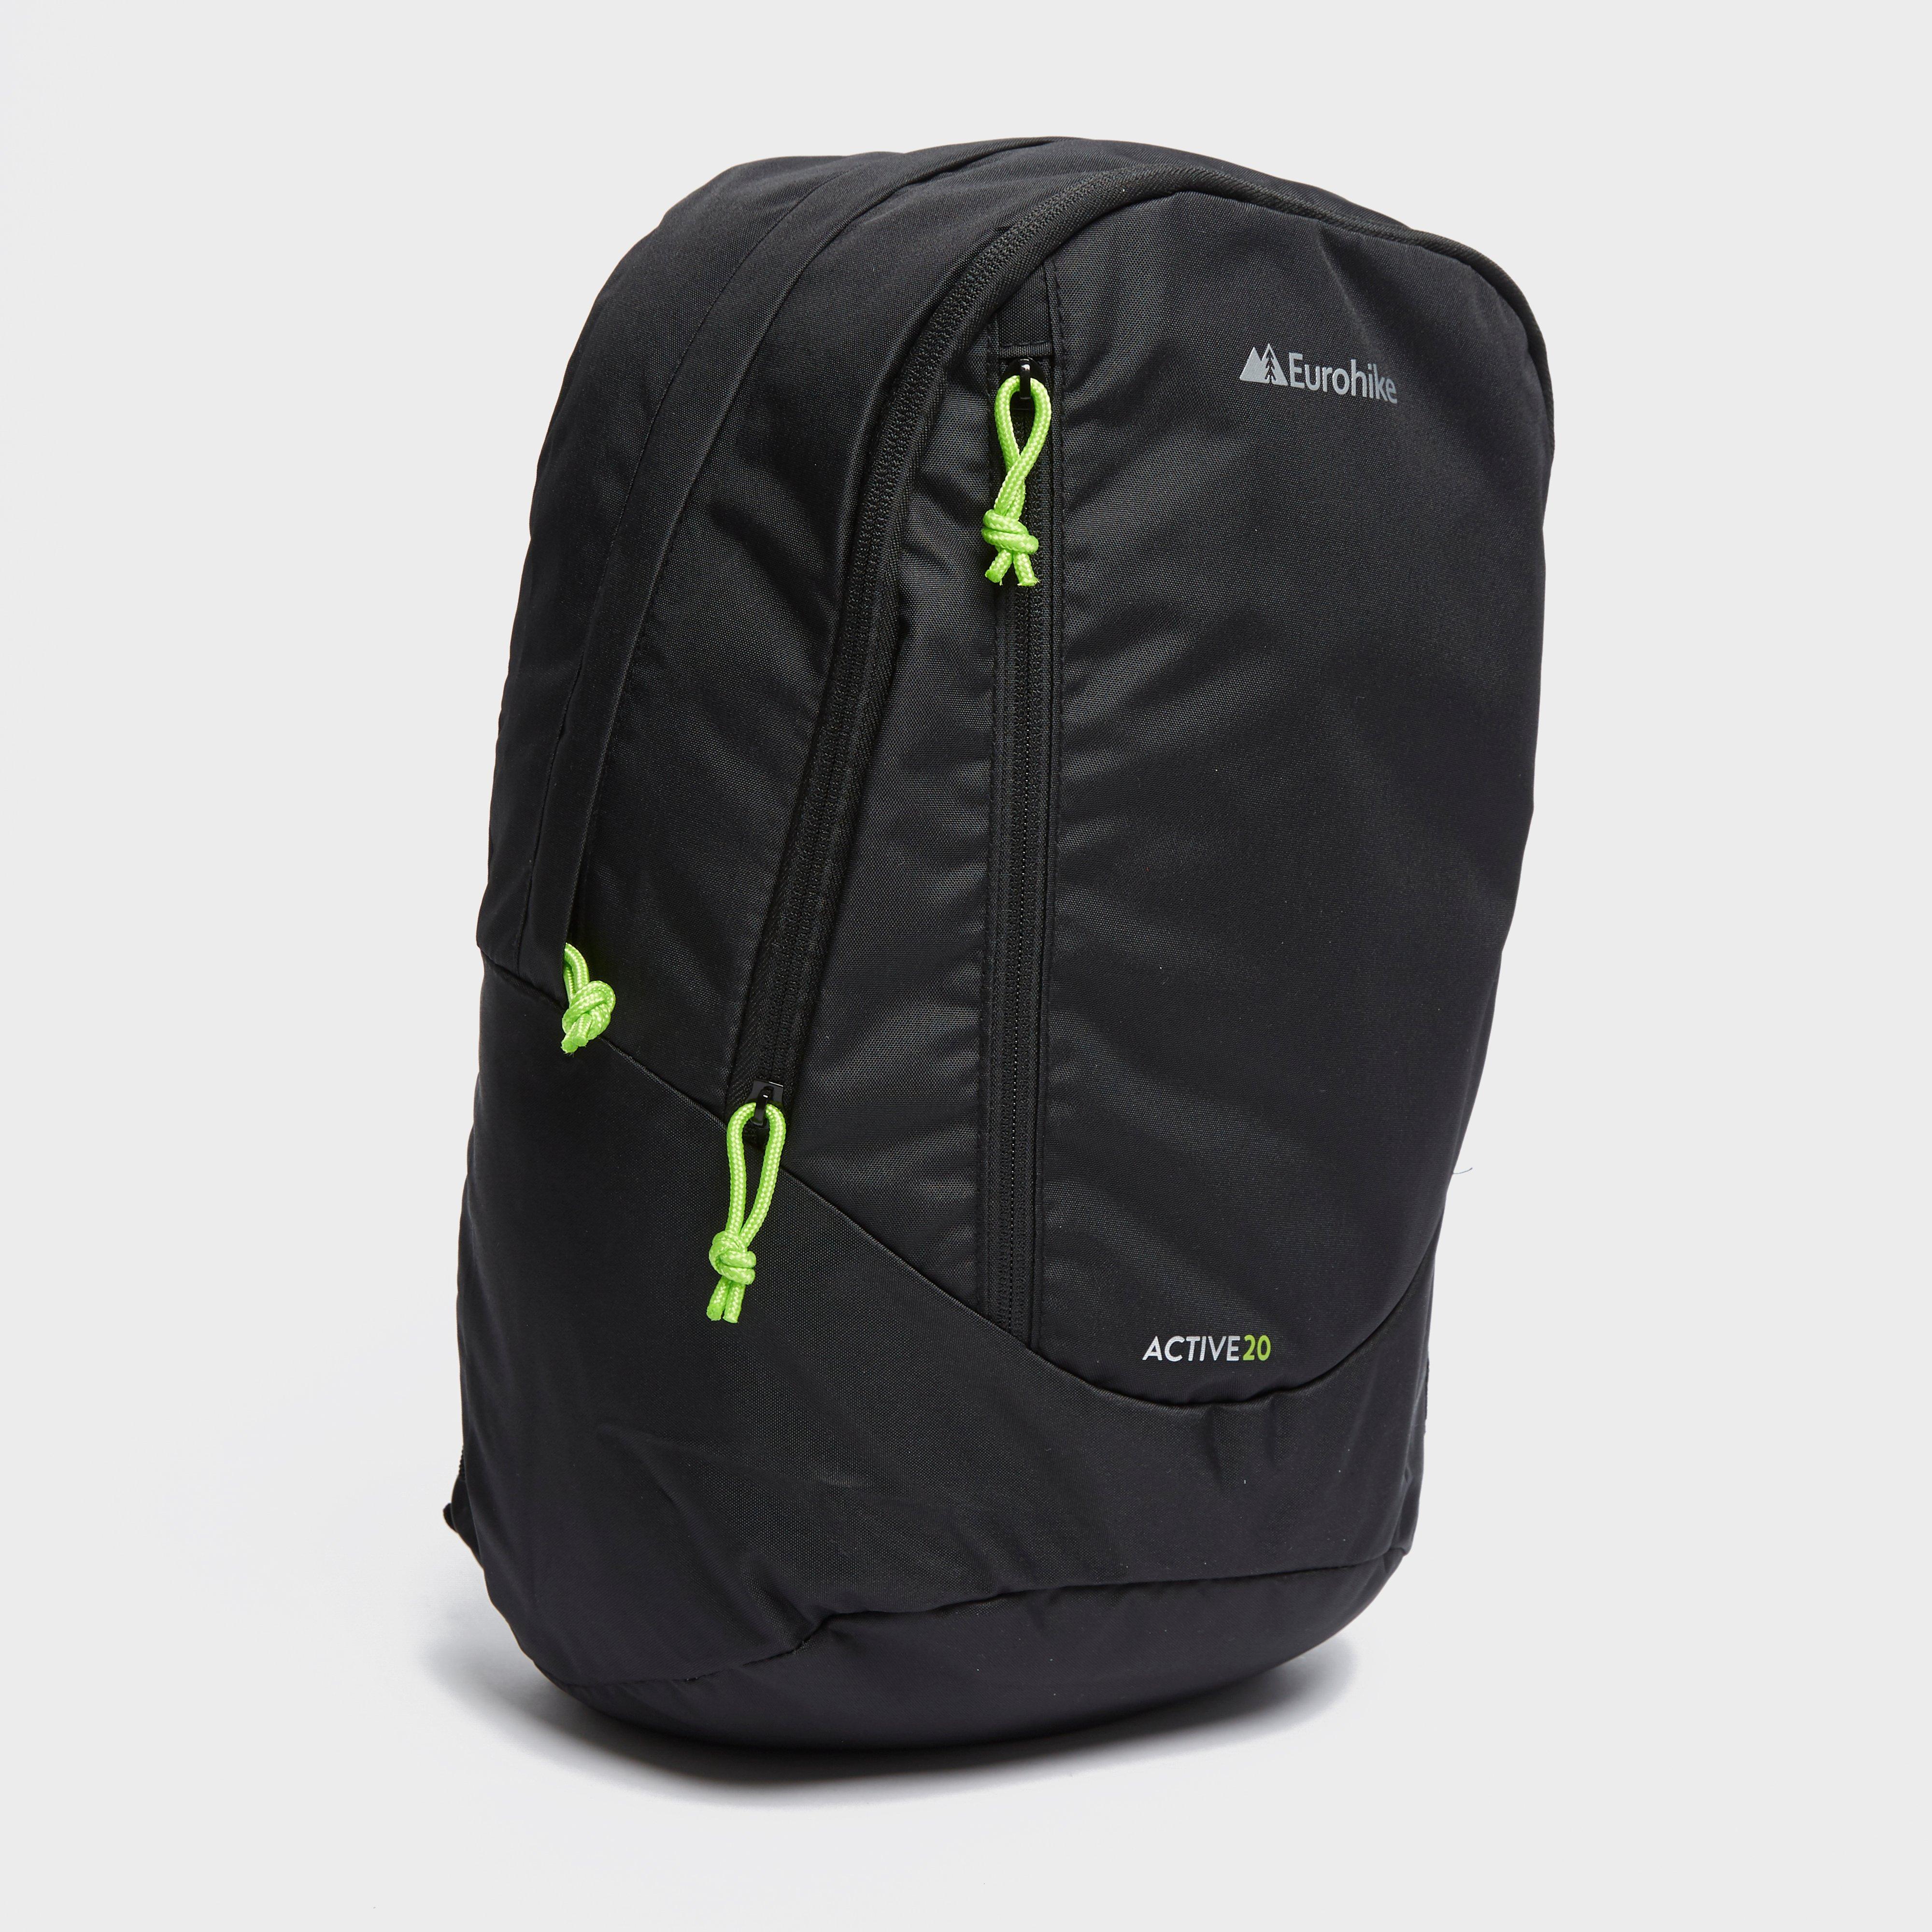 Eurohike Active 20 Daypack, Black